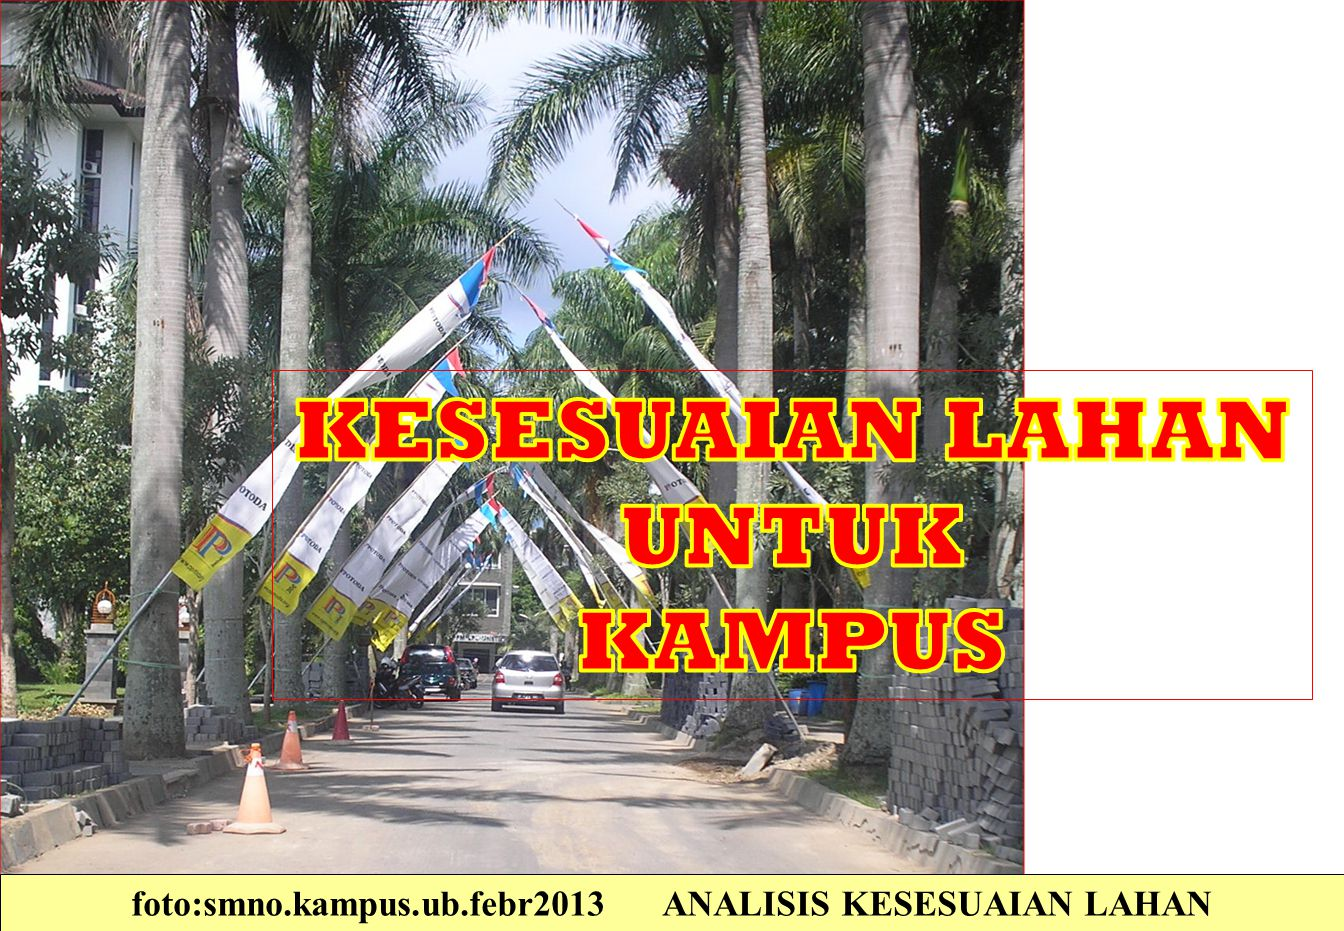 foto:smno.kampus.ub.febr2013 ANALISIS KESESUAIAN LAHAN